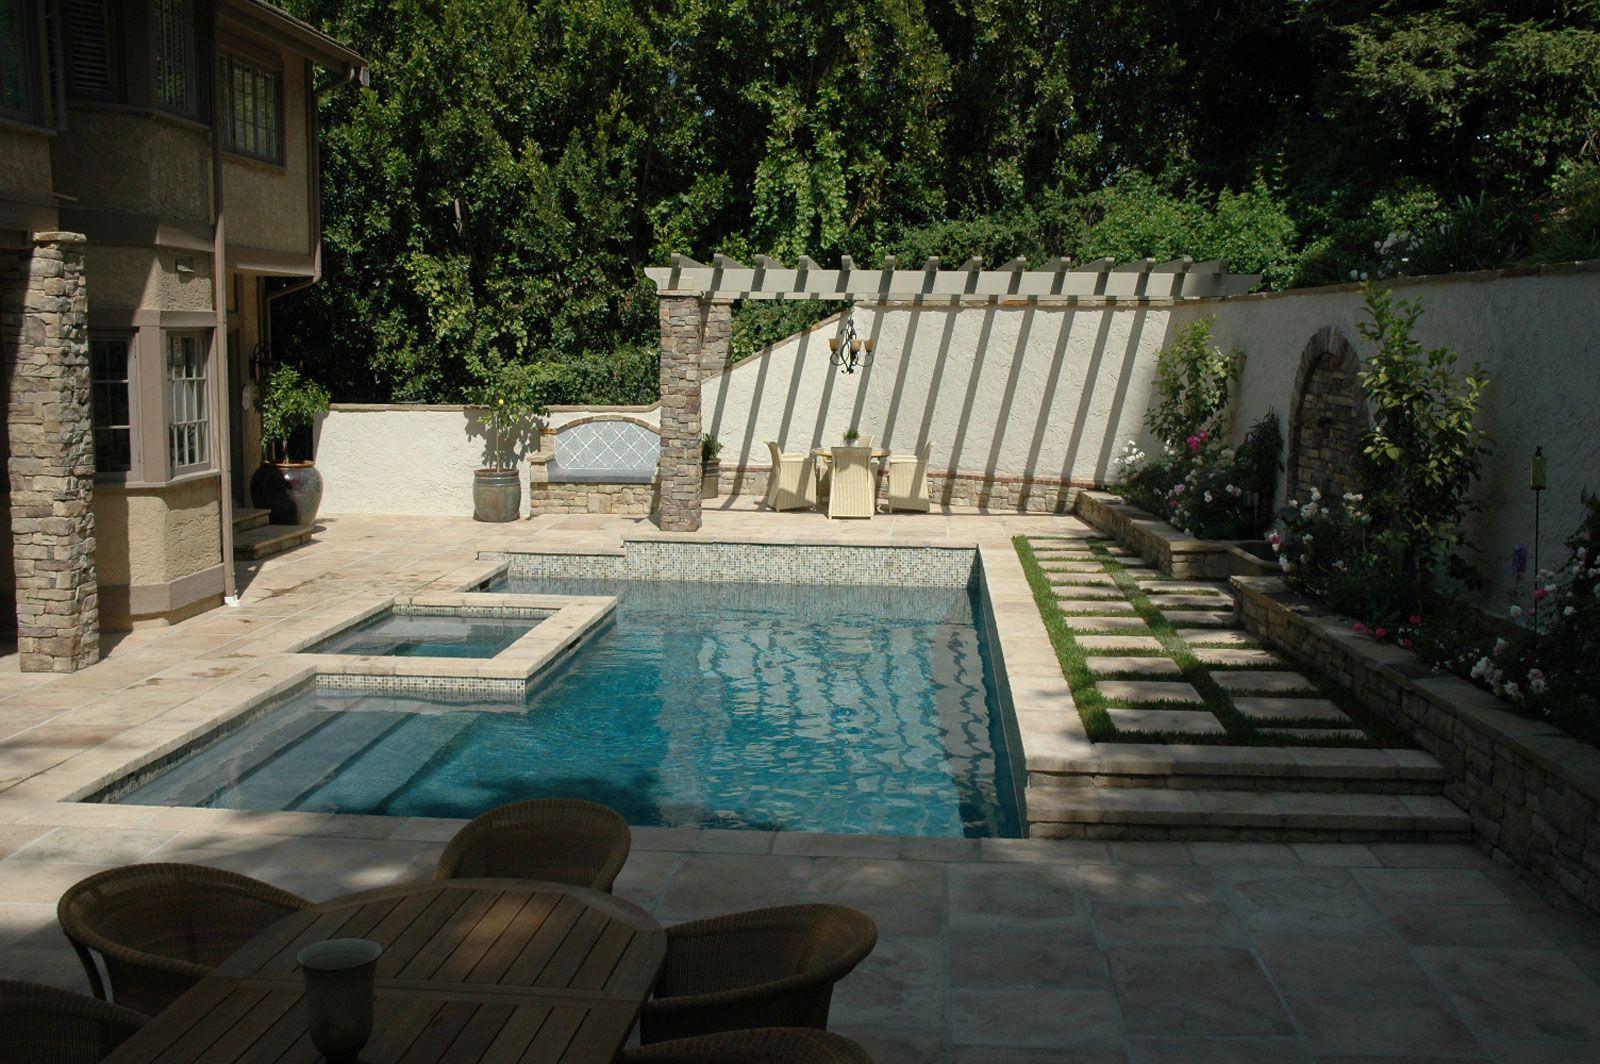 Rectangular Pool & Spa, Raised Deck & Grass W/ Stepping